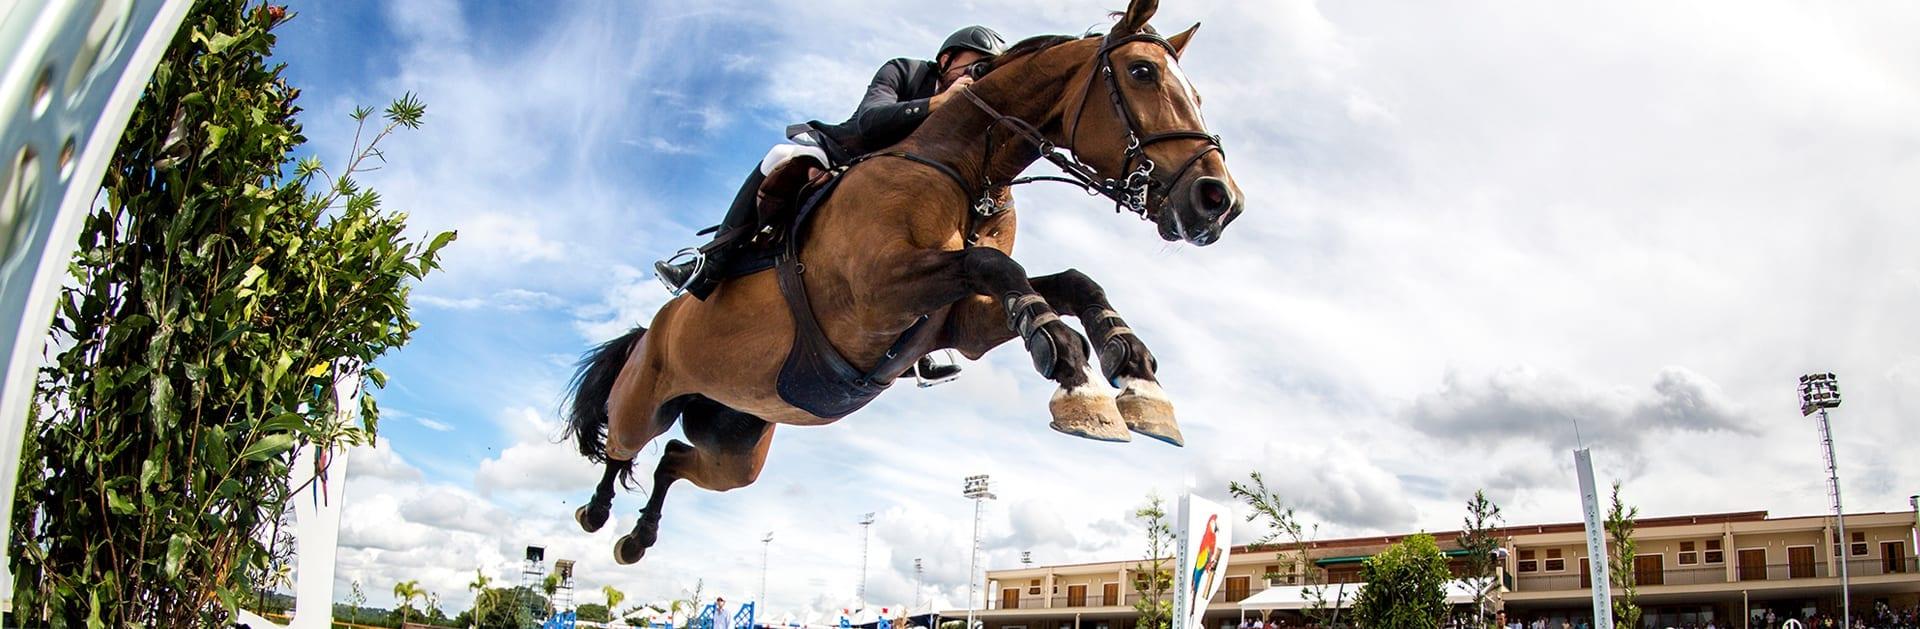 wellington florida horse